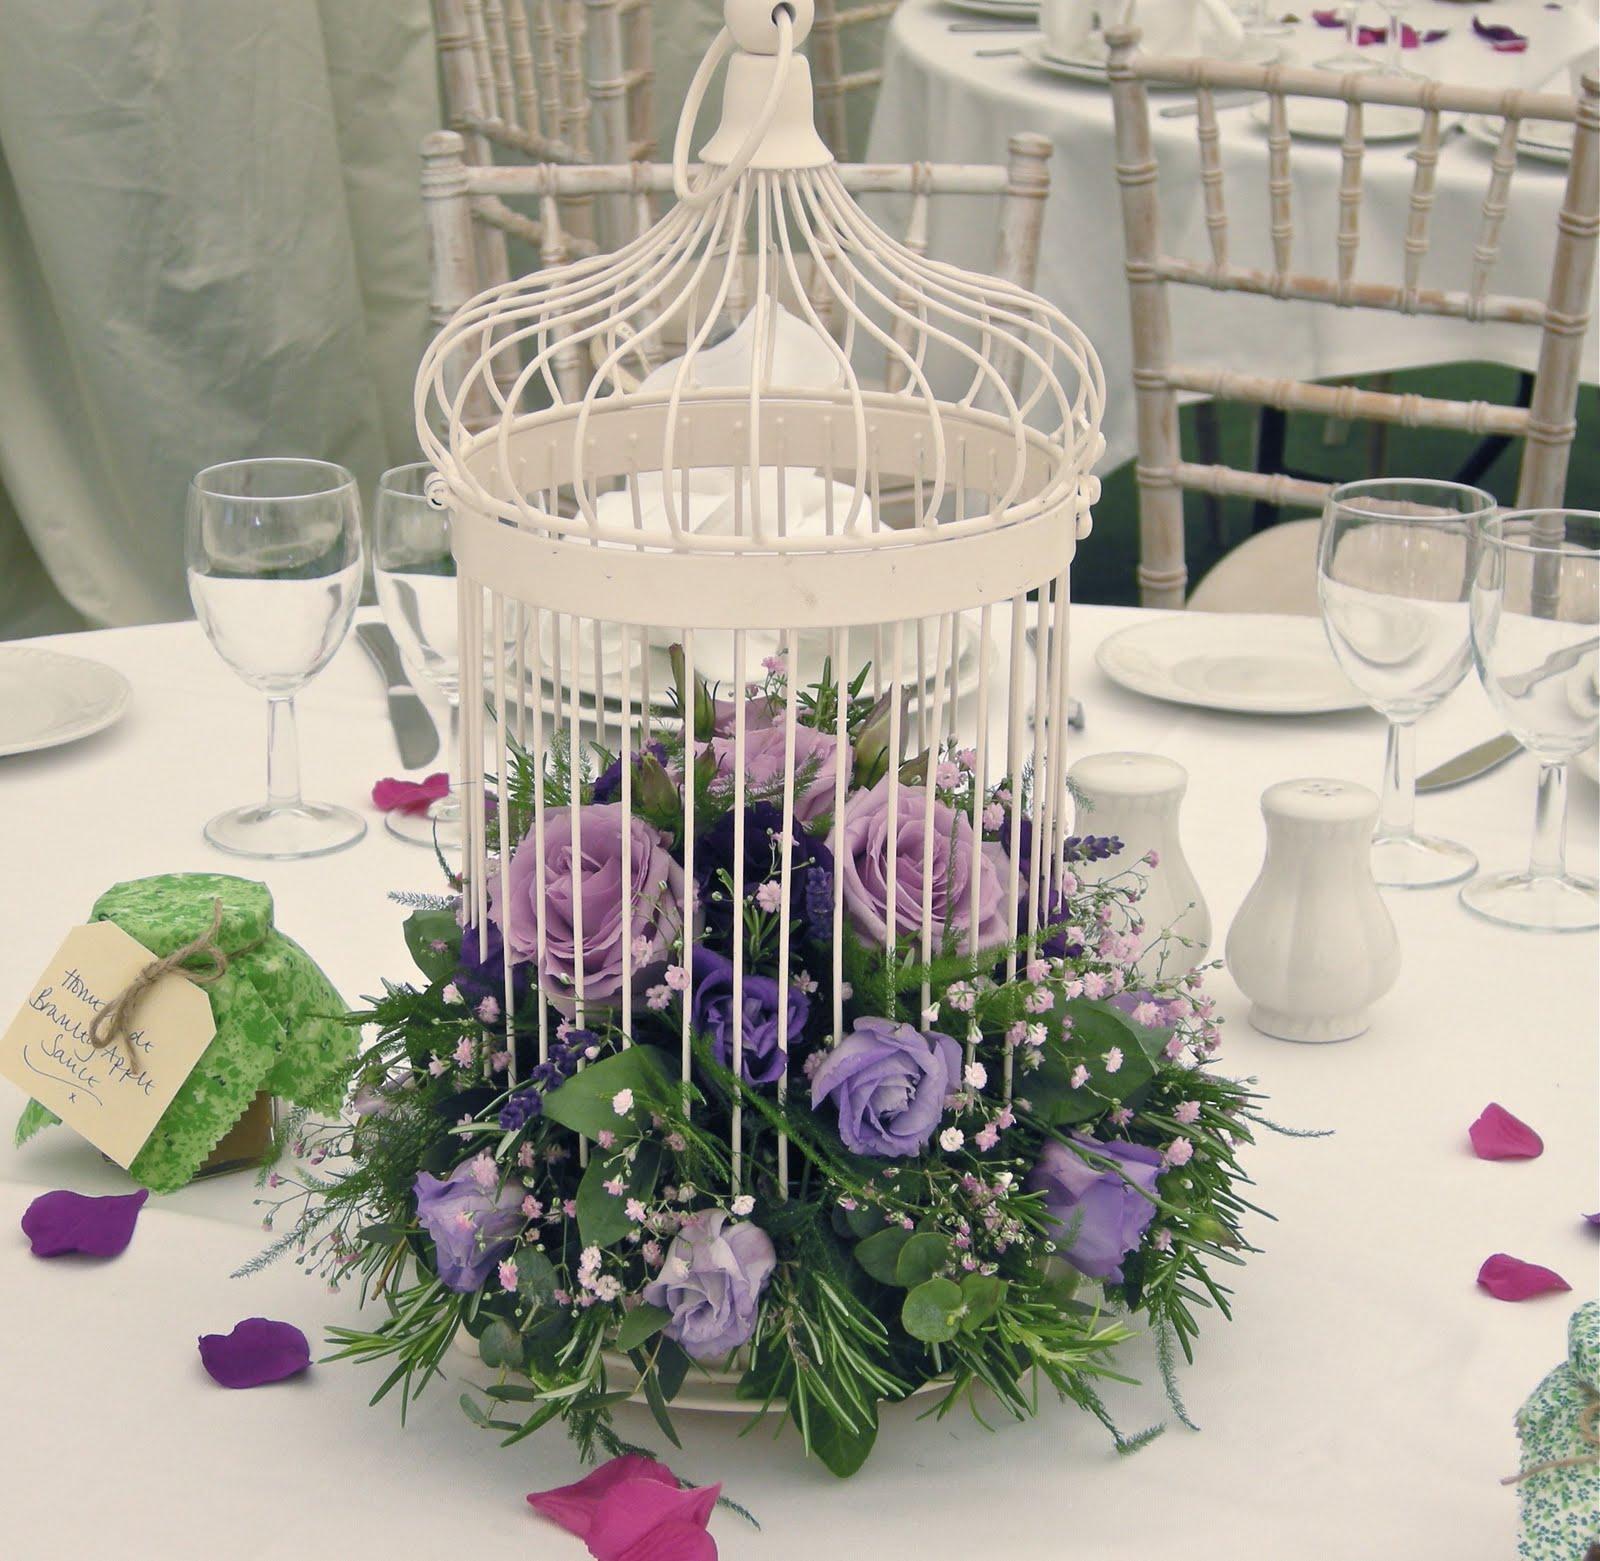 Clarnettes blog tall wedding centerpiece vases reviewsmspy